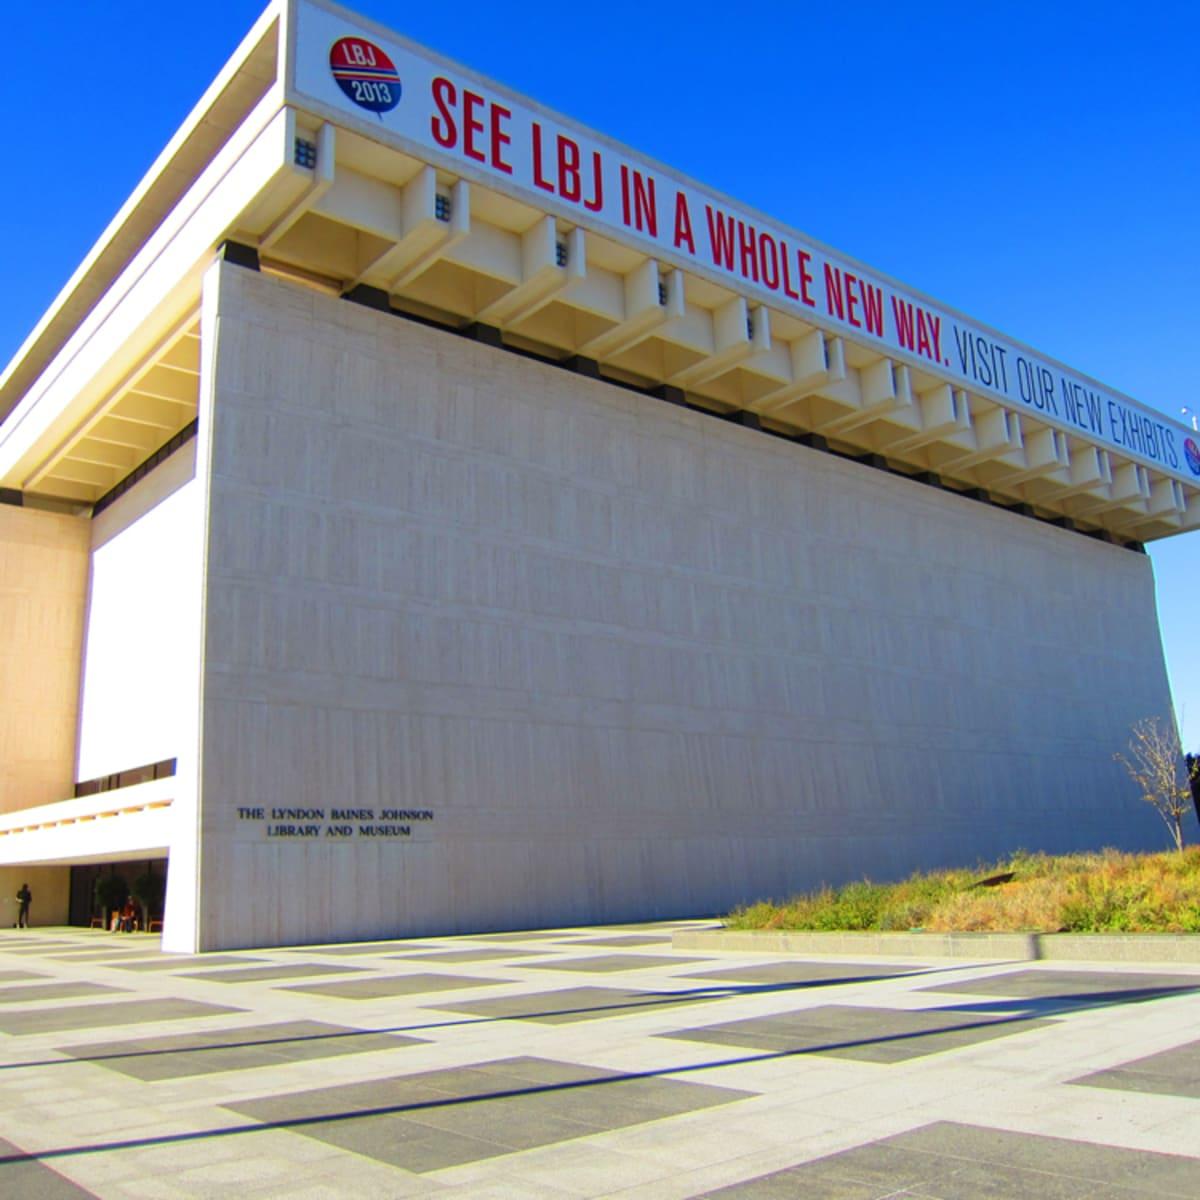 Austin Photo Set: News_Shelley_LBJ library_dec 2012_exterior